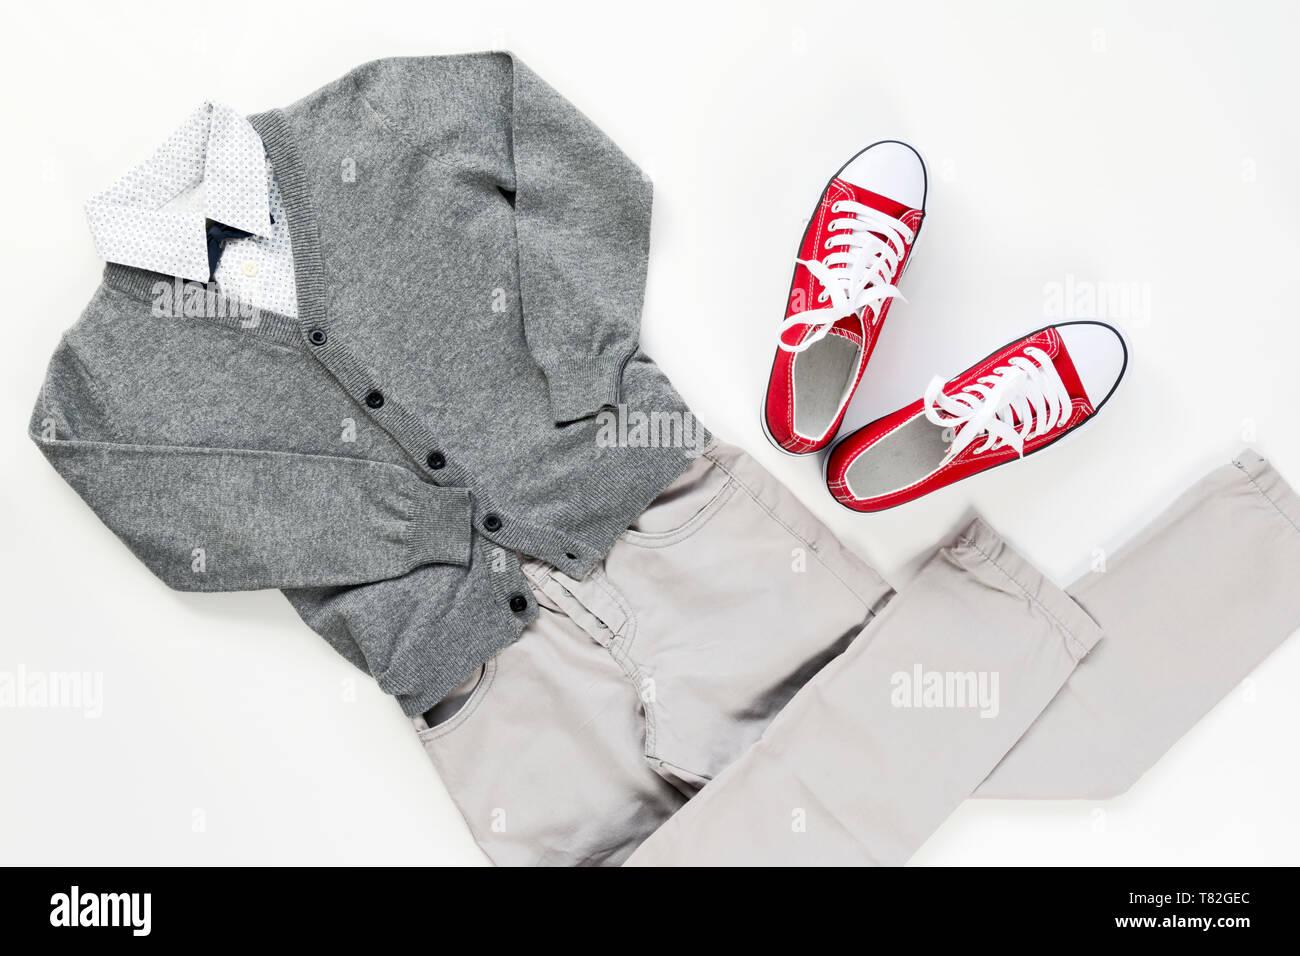 Set of trendy fashion male clothing elements isolated on white, school concept uniform - Stock Image